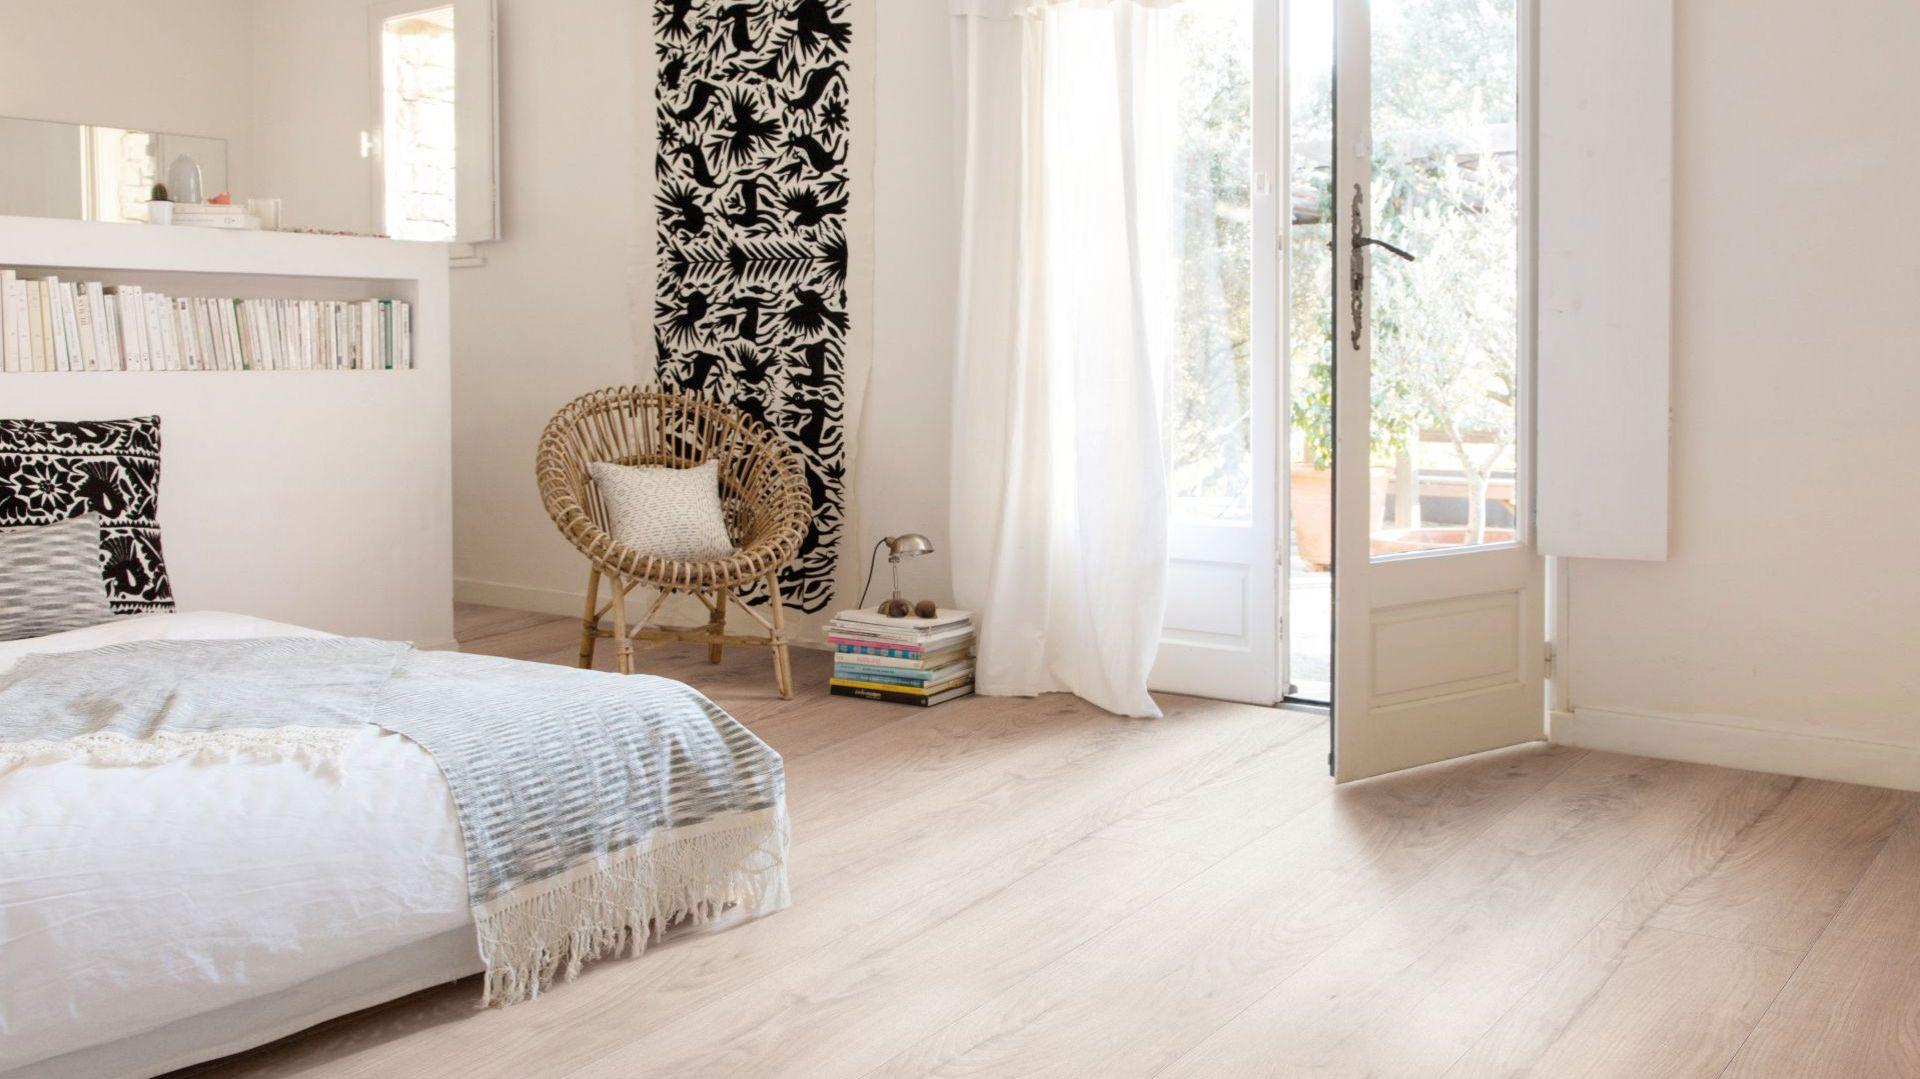 Kolekcja paneli Alloc Grand Avenue/Nobless Polska. Produkt zgłoszony do konkursu Dobry Design 2020.